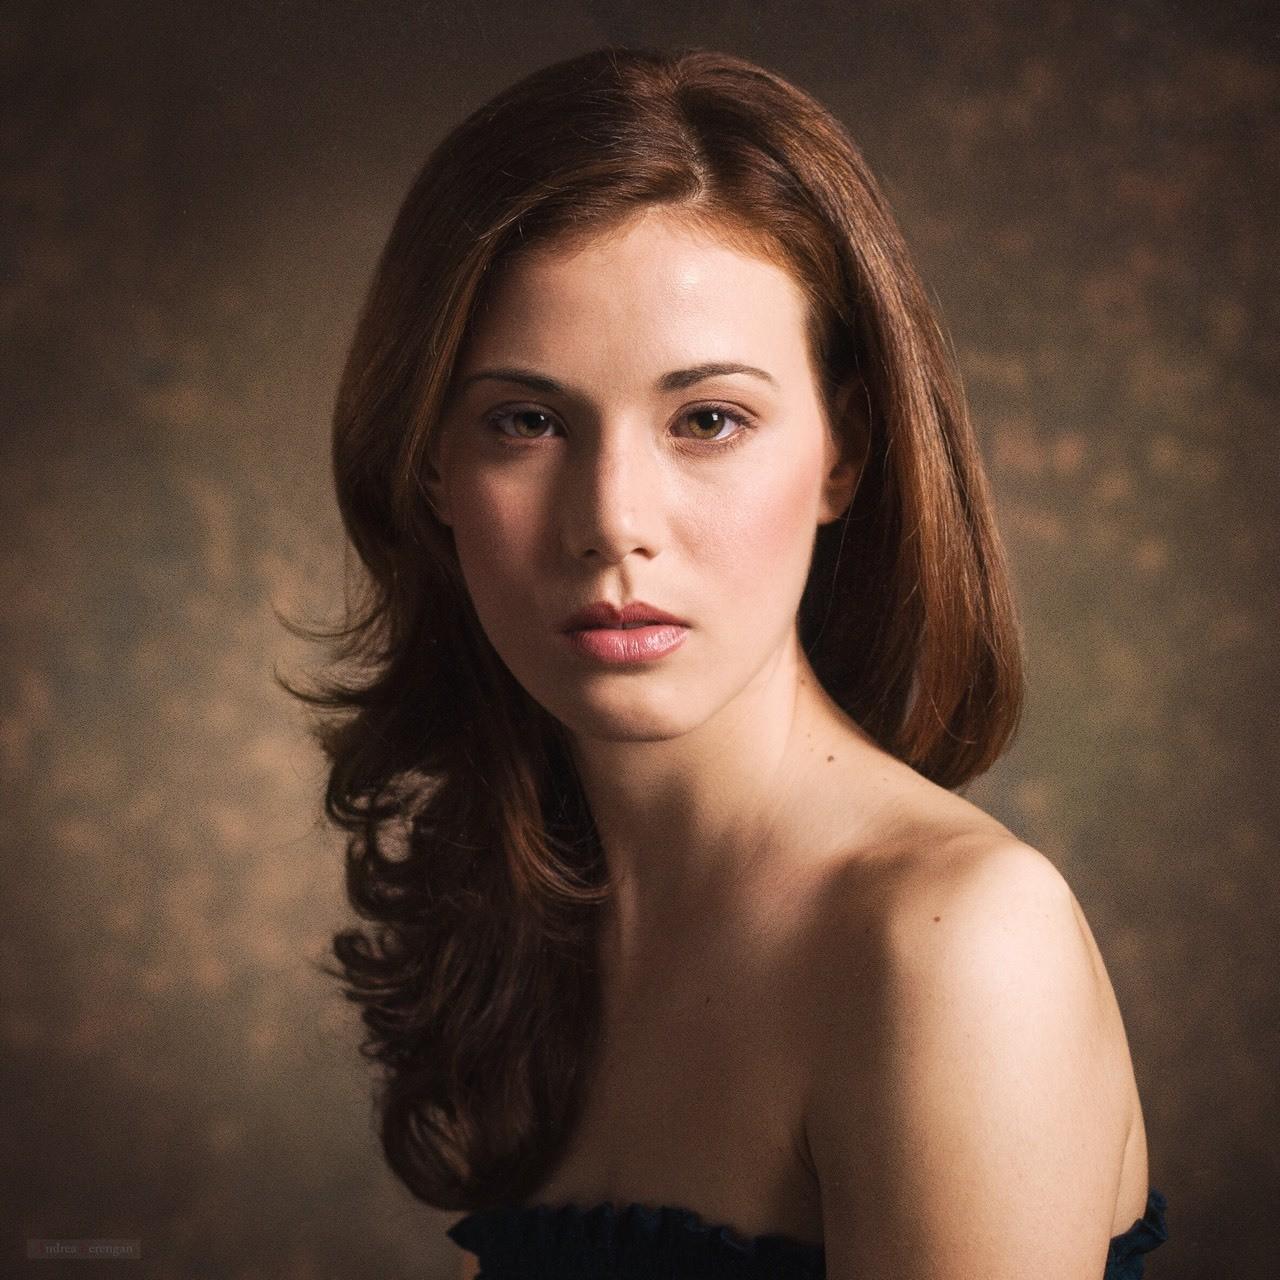 Classic Portrait Model Laura